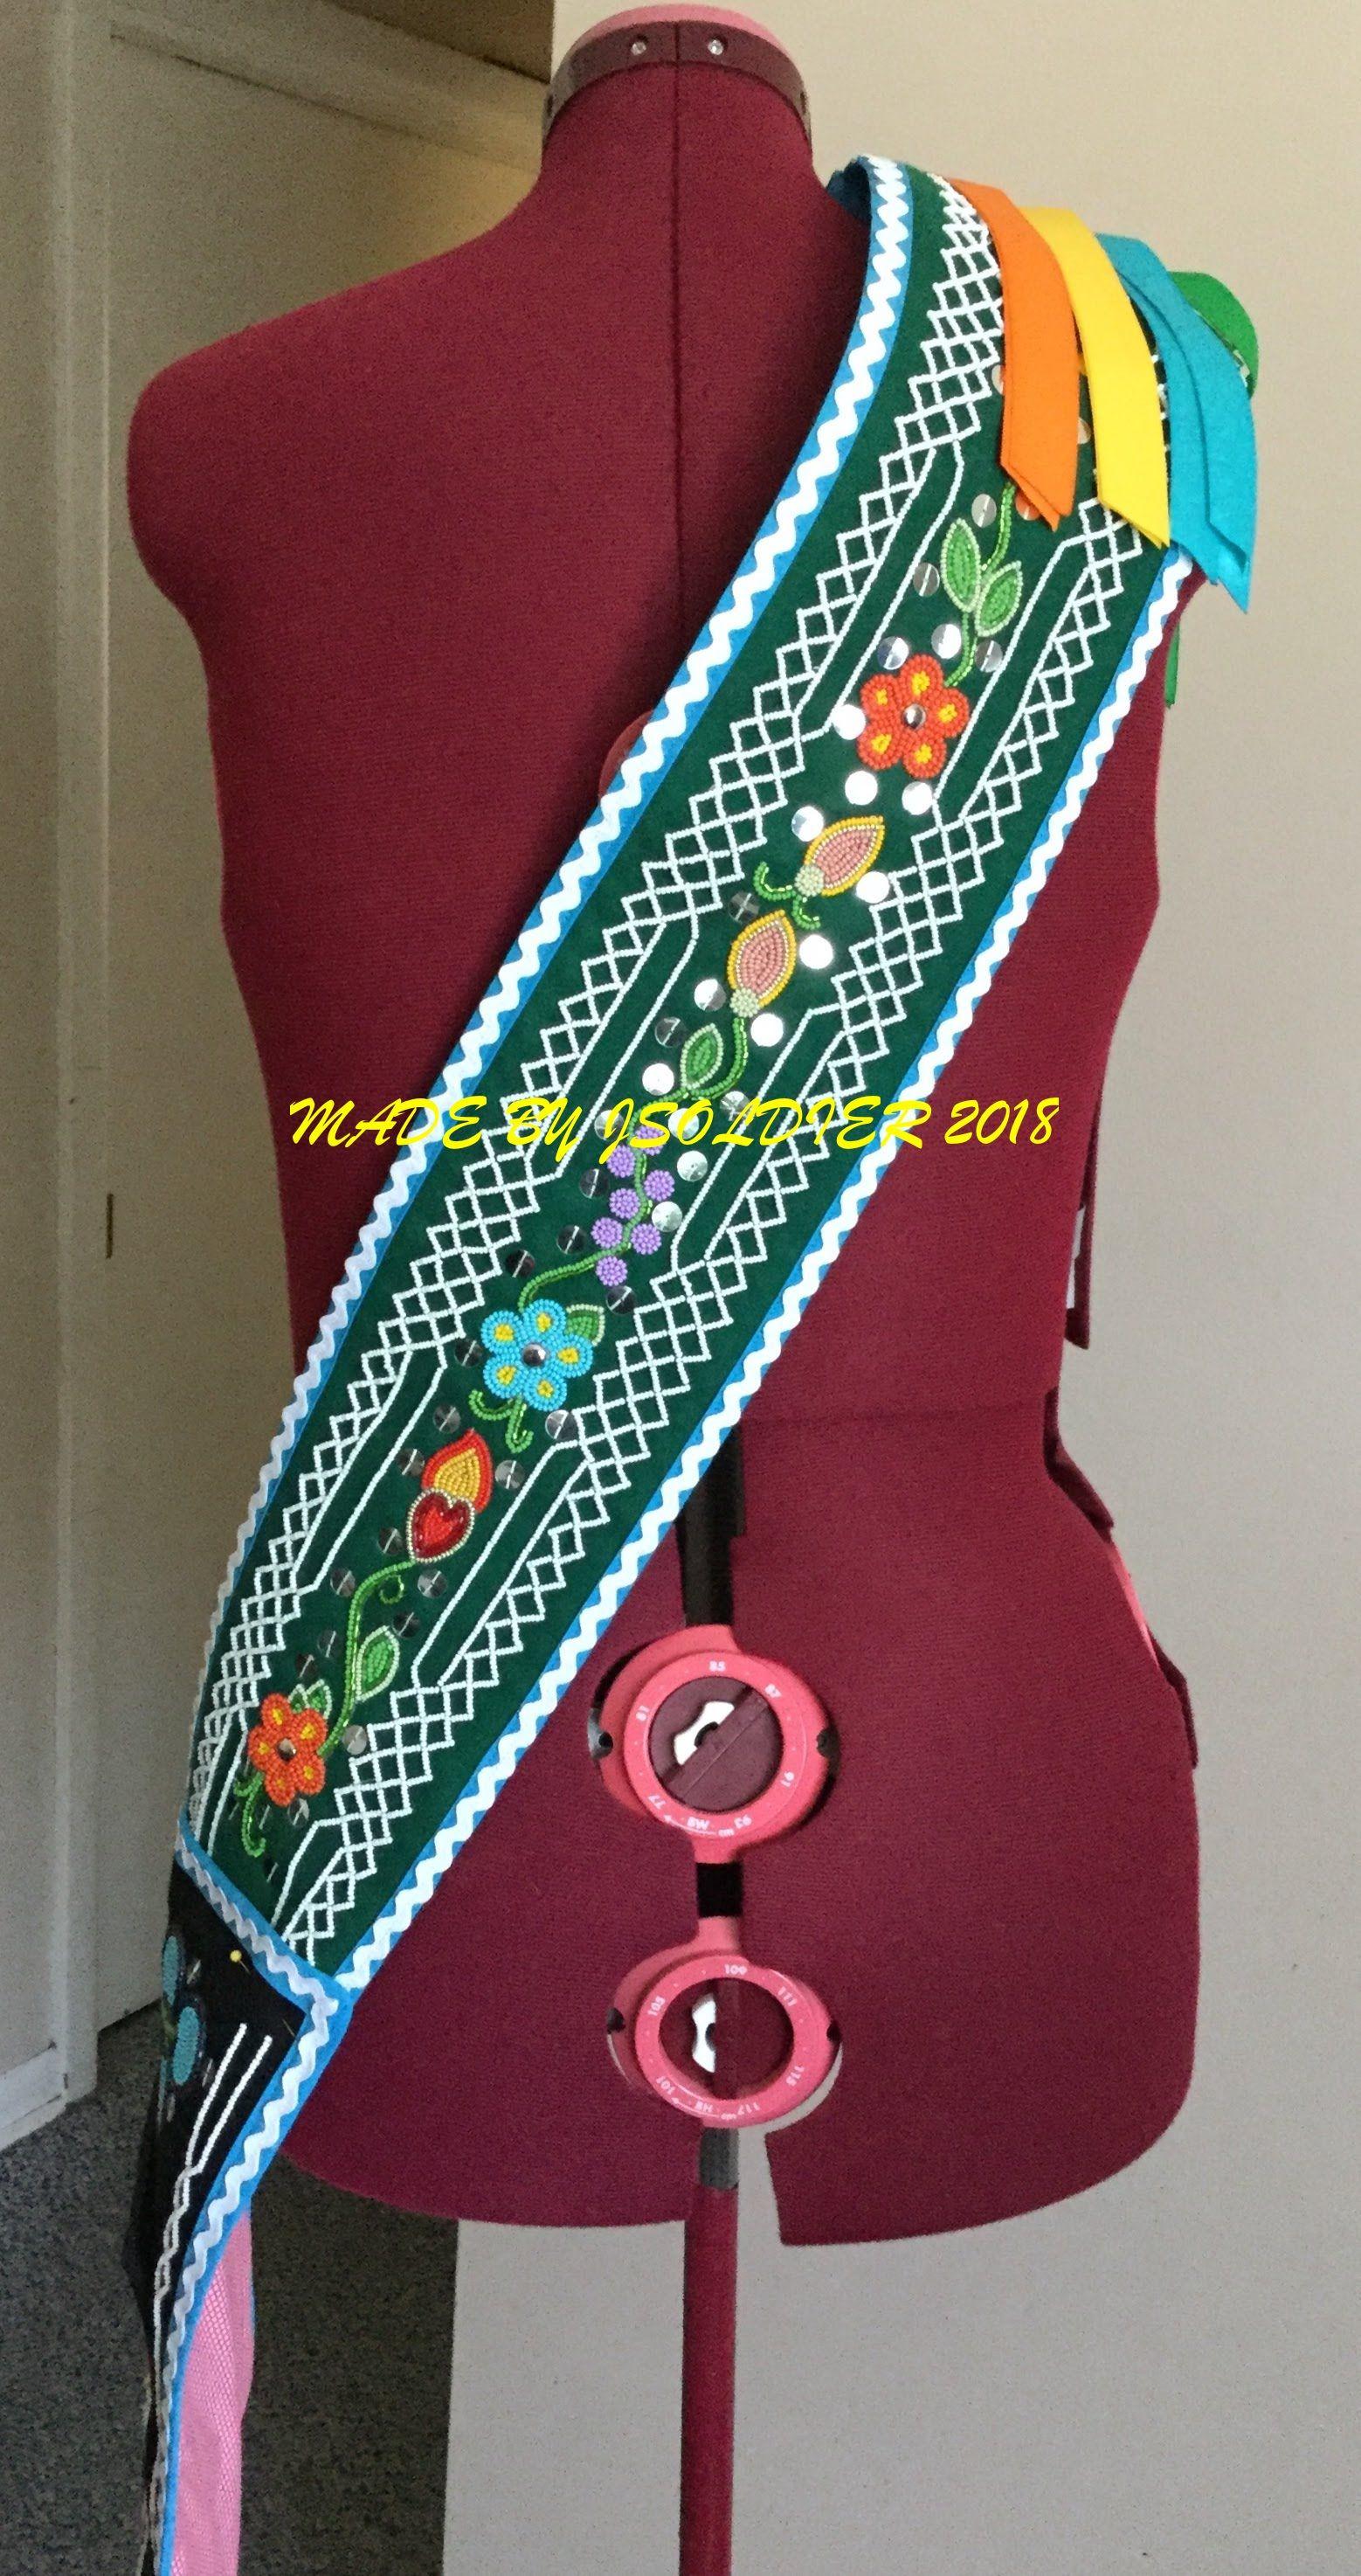 Back view of bandolier bag bandolier bags pinterest